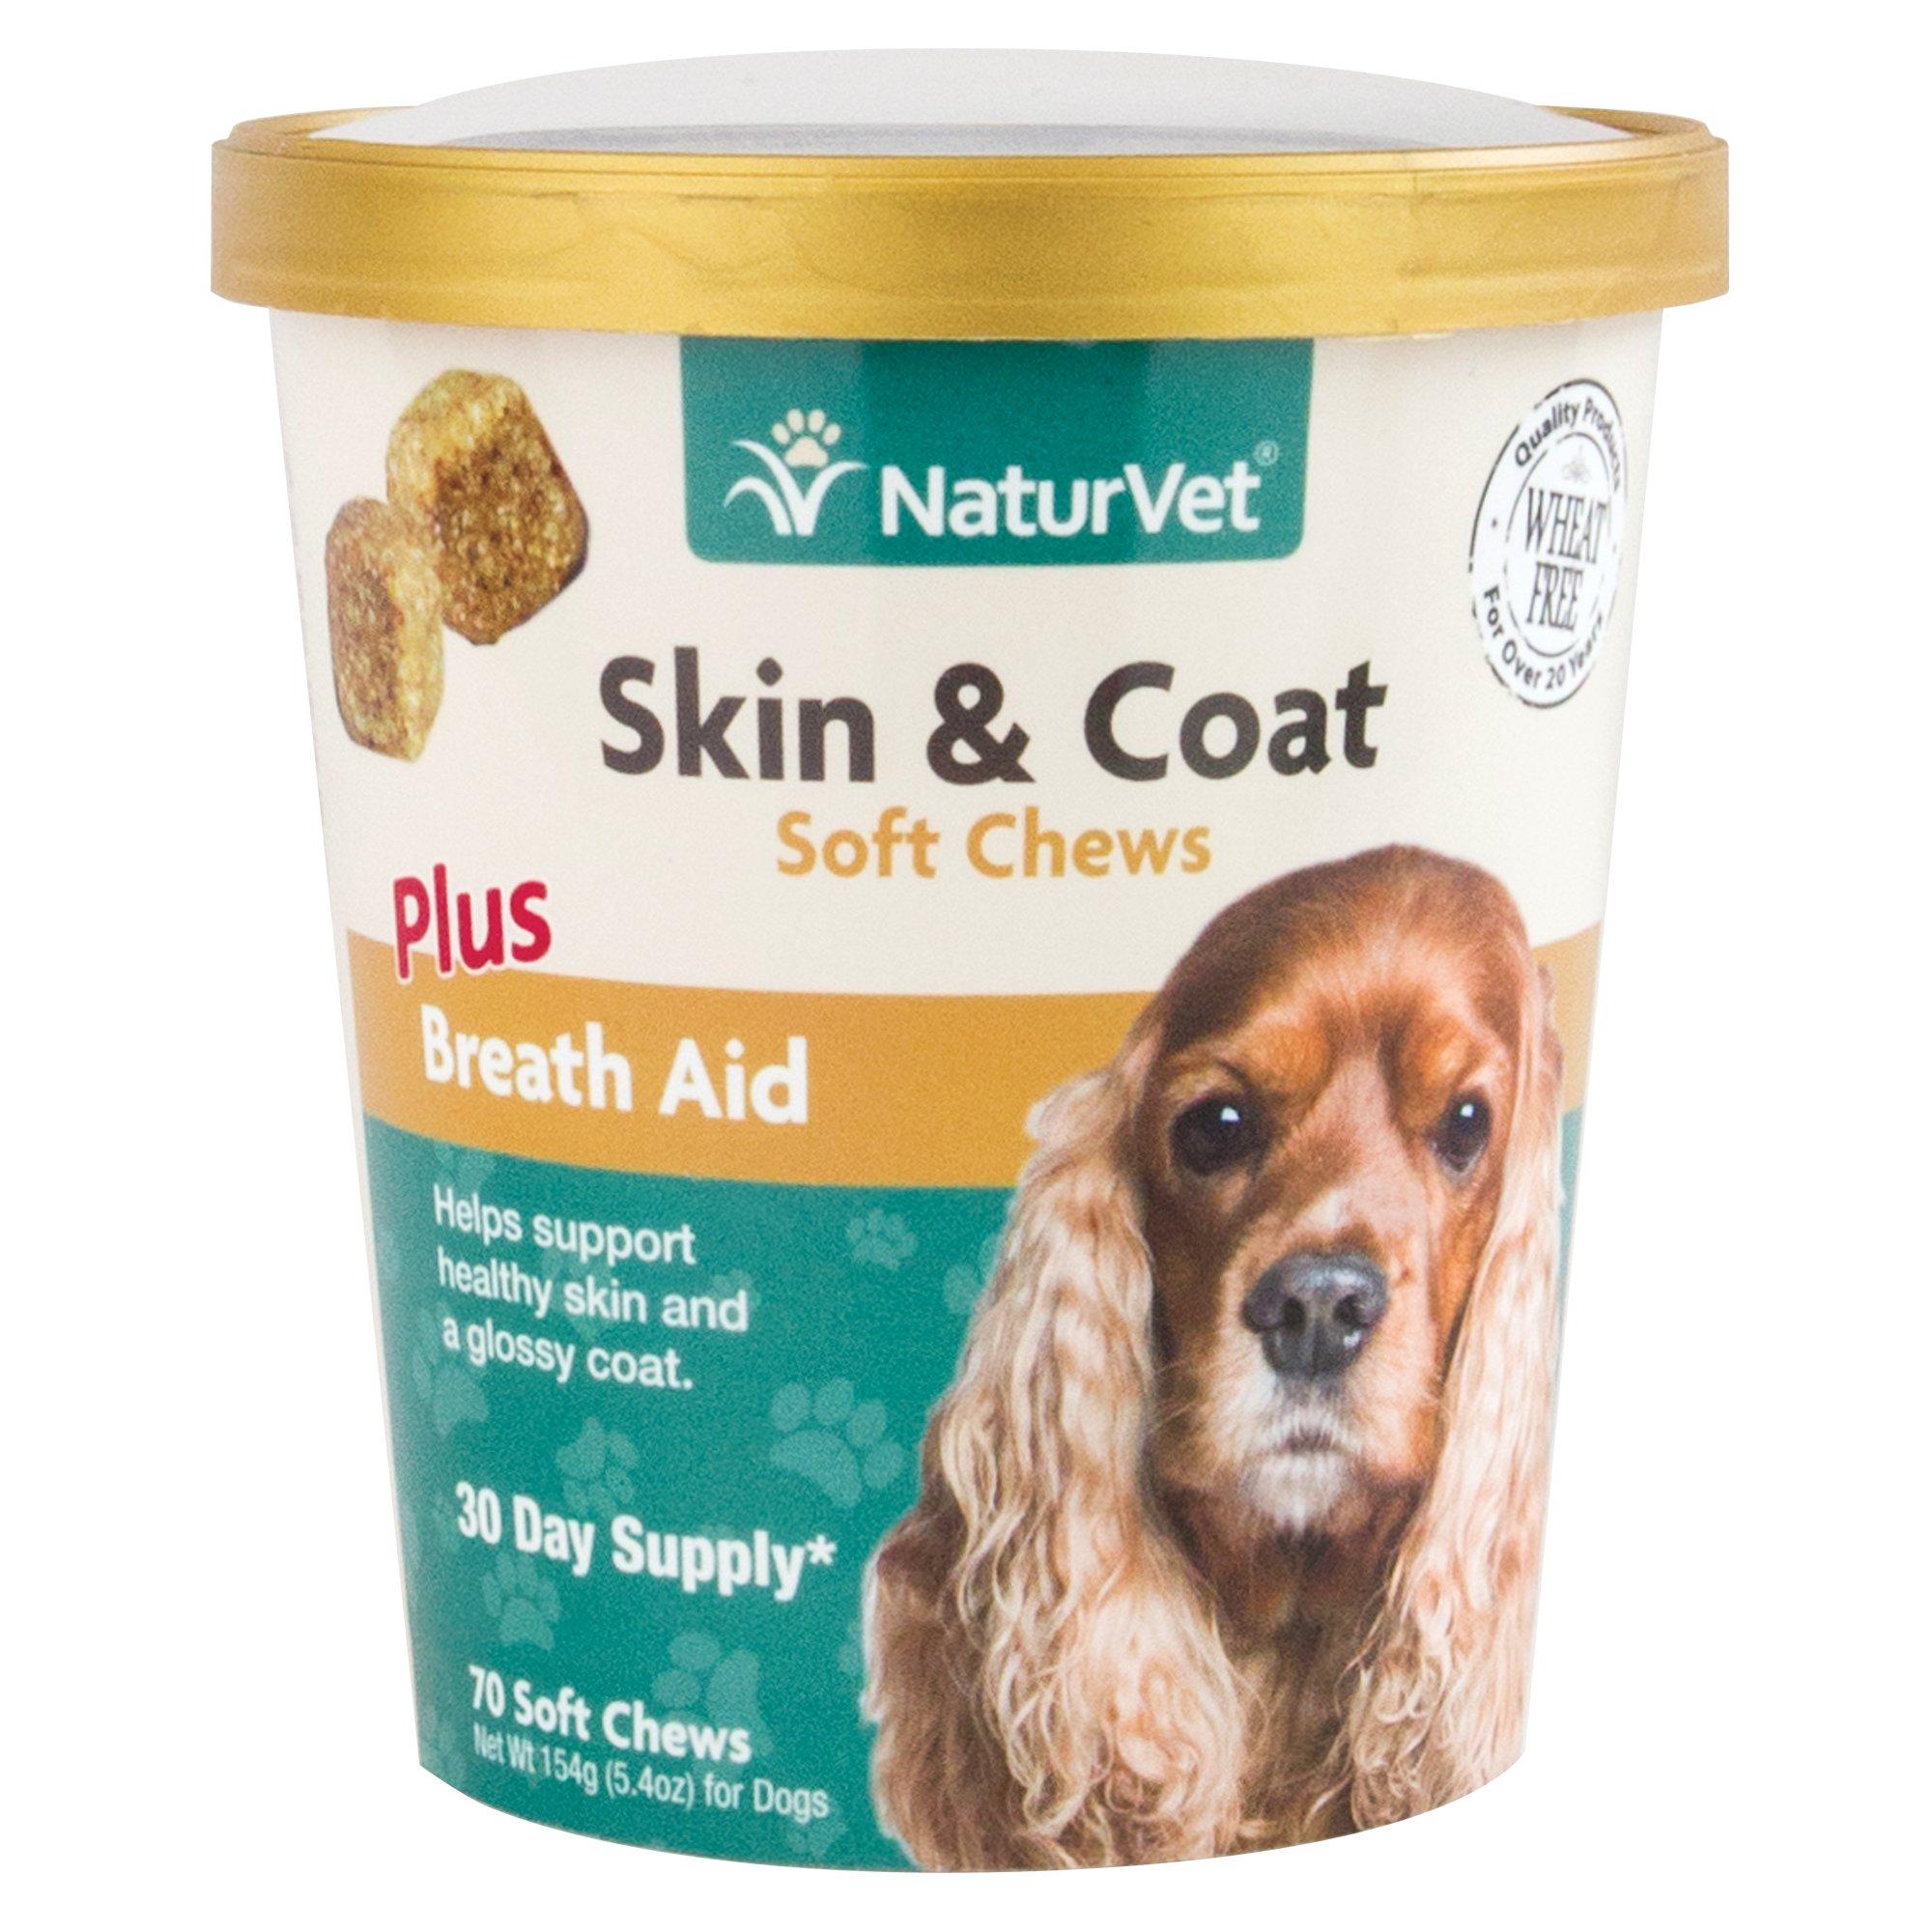 NaturVet Skin & Coat Plus Breath Aid Dog Soft Chews